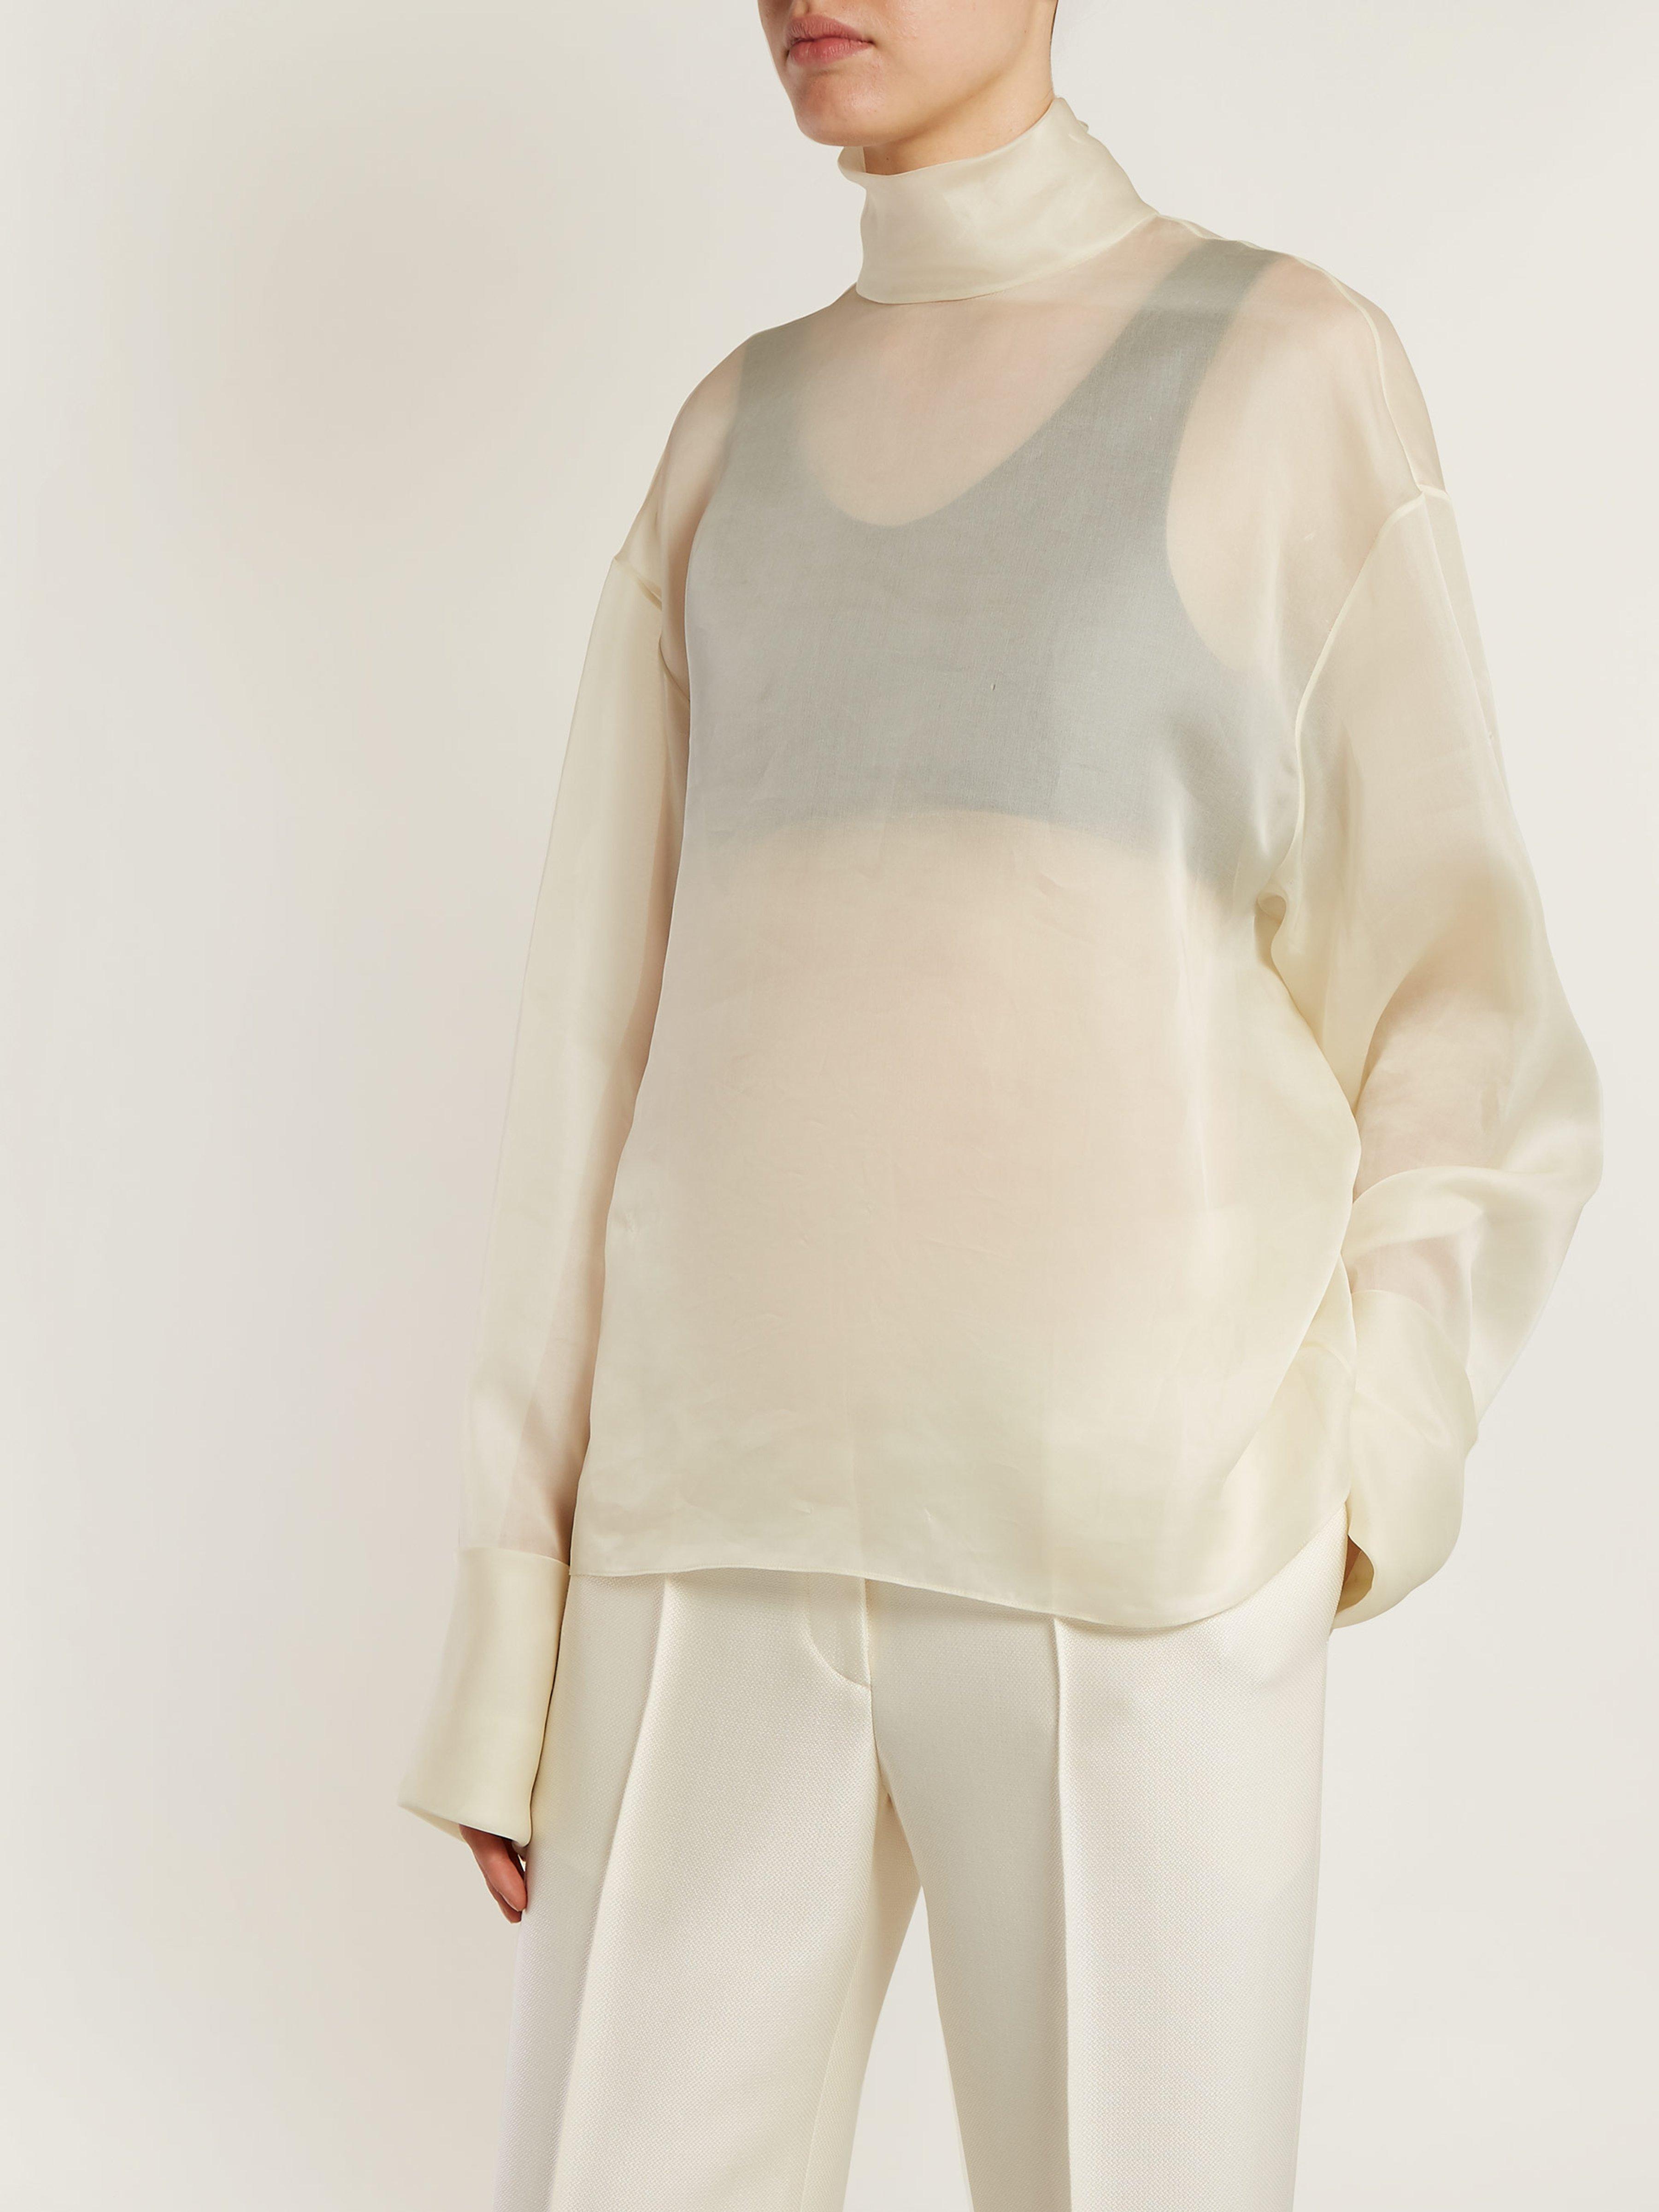 9abf8e89daf5b The Row Karlee Silk Organza Blouse in White - Lyst